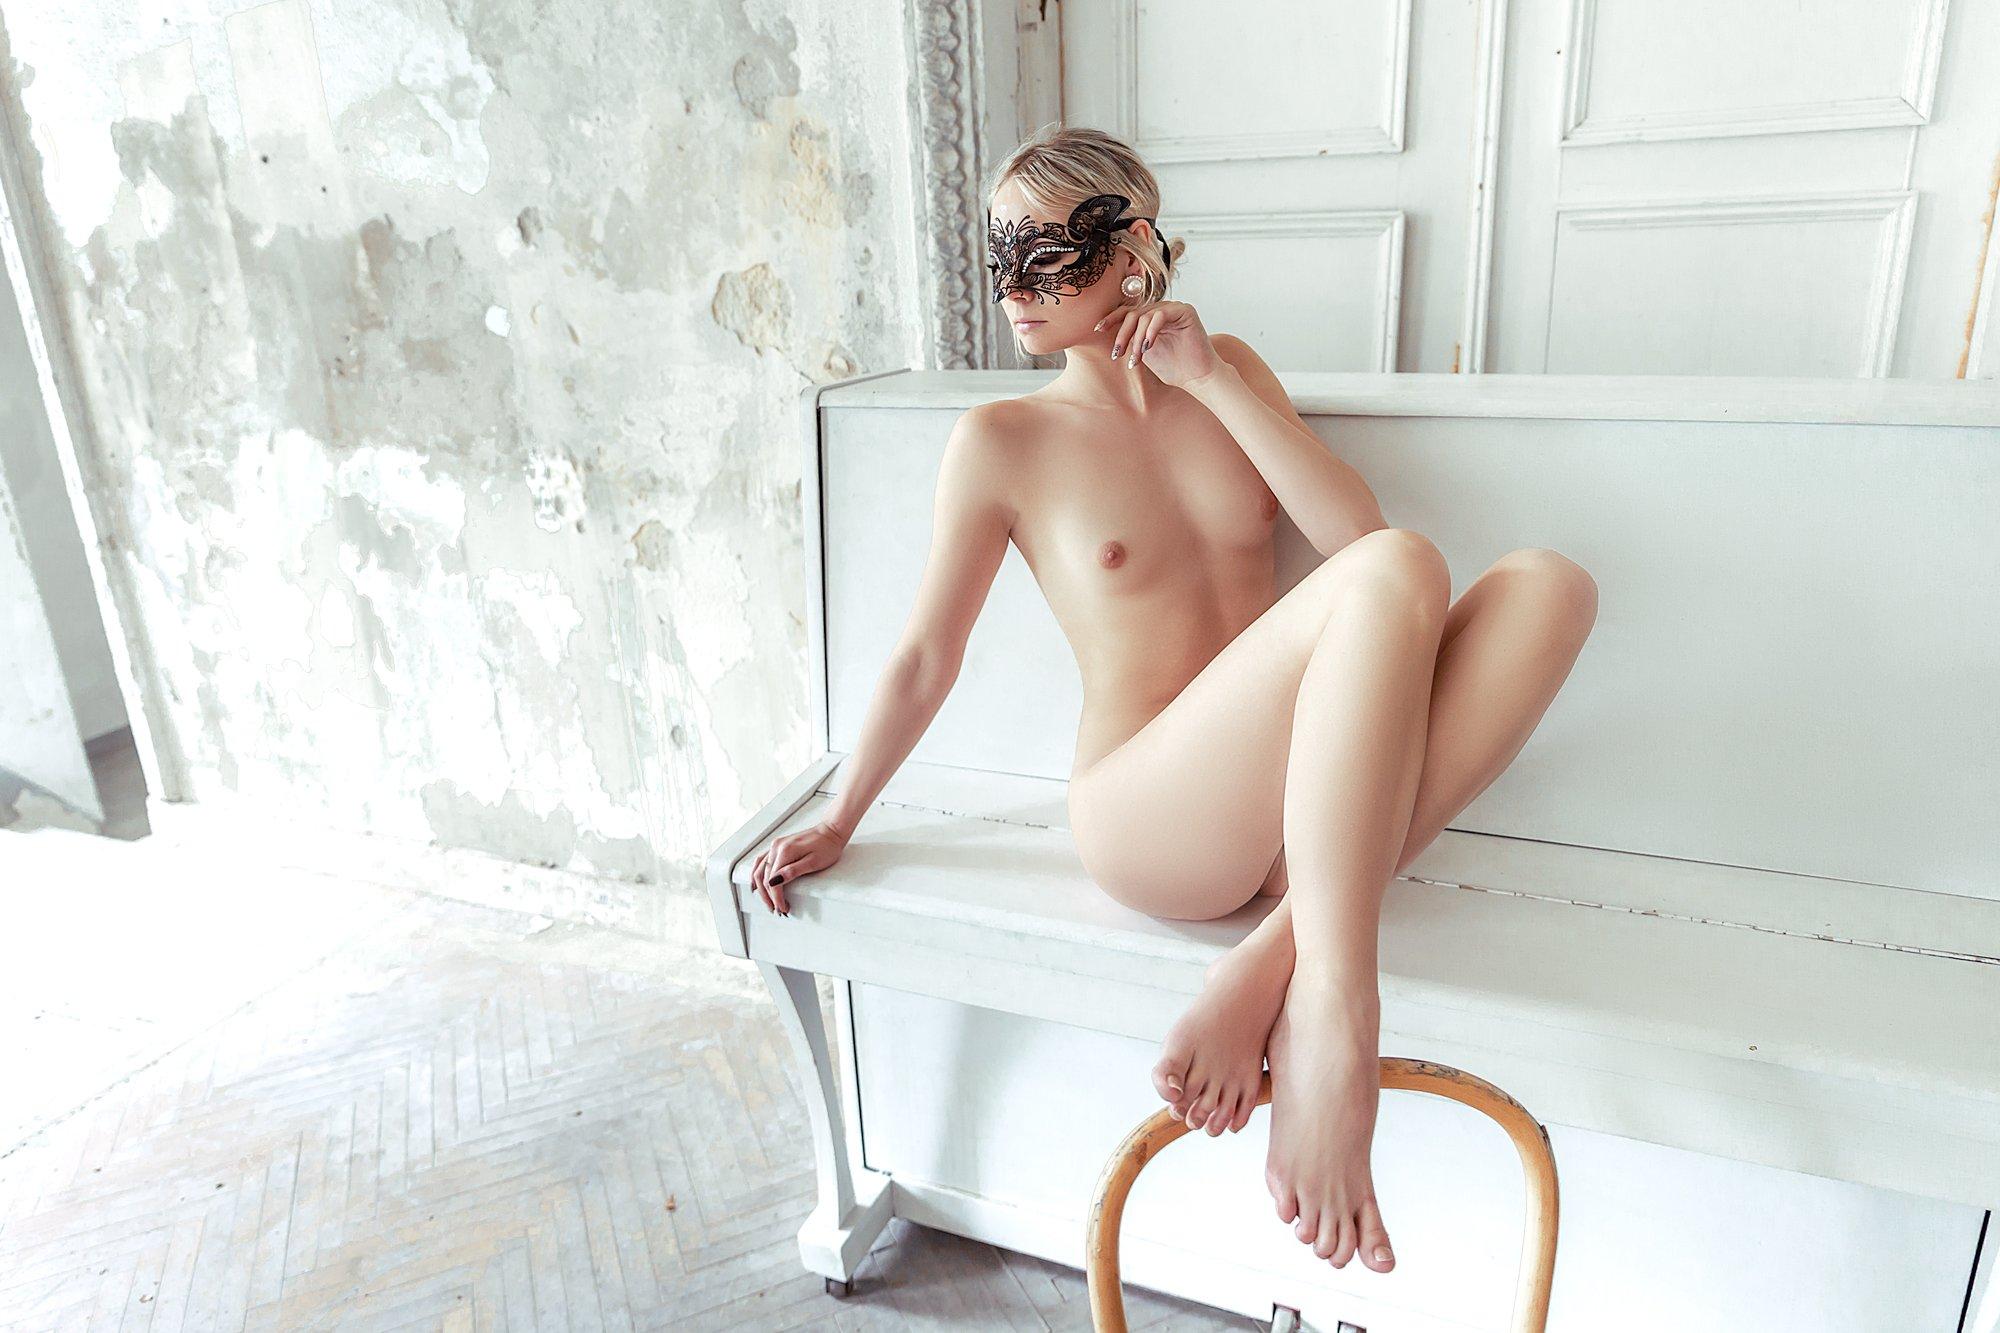 woman, nude, indoors, art, light, Руслан Болгов (Axe)